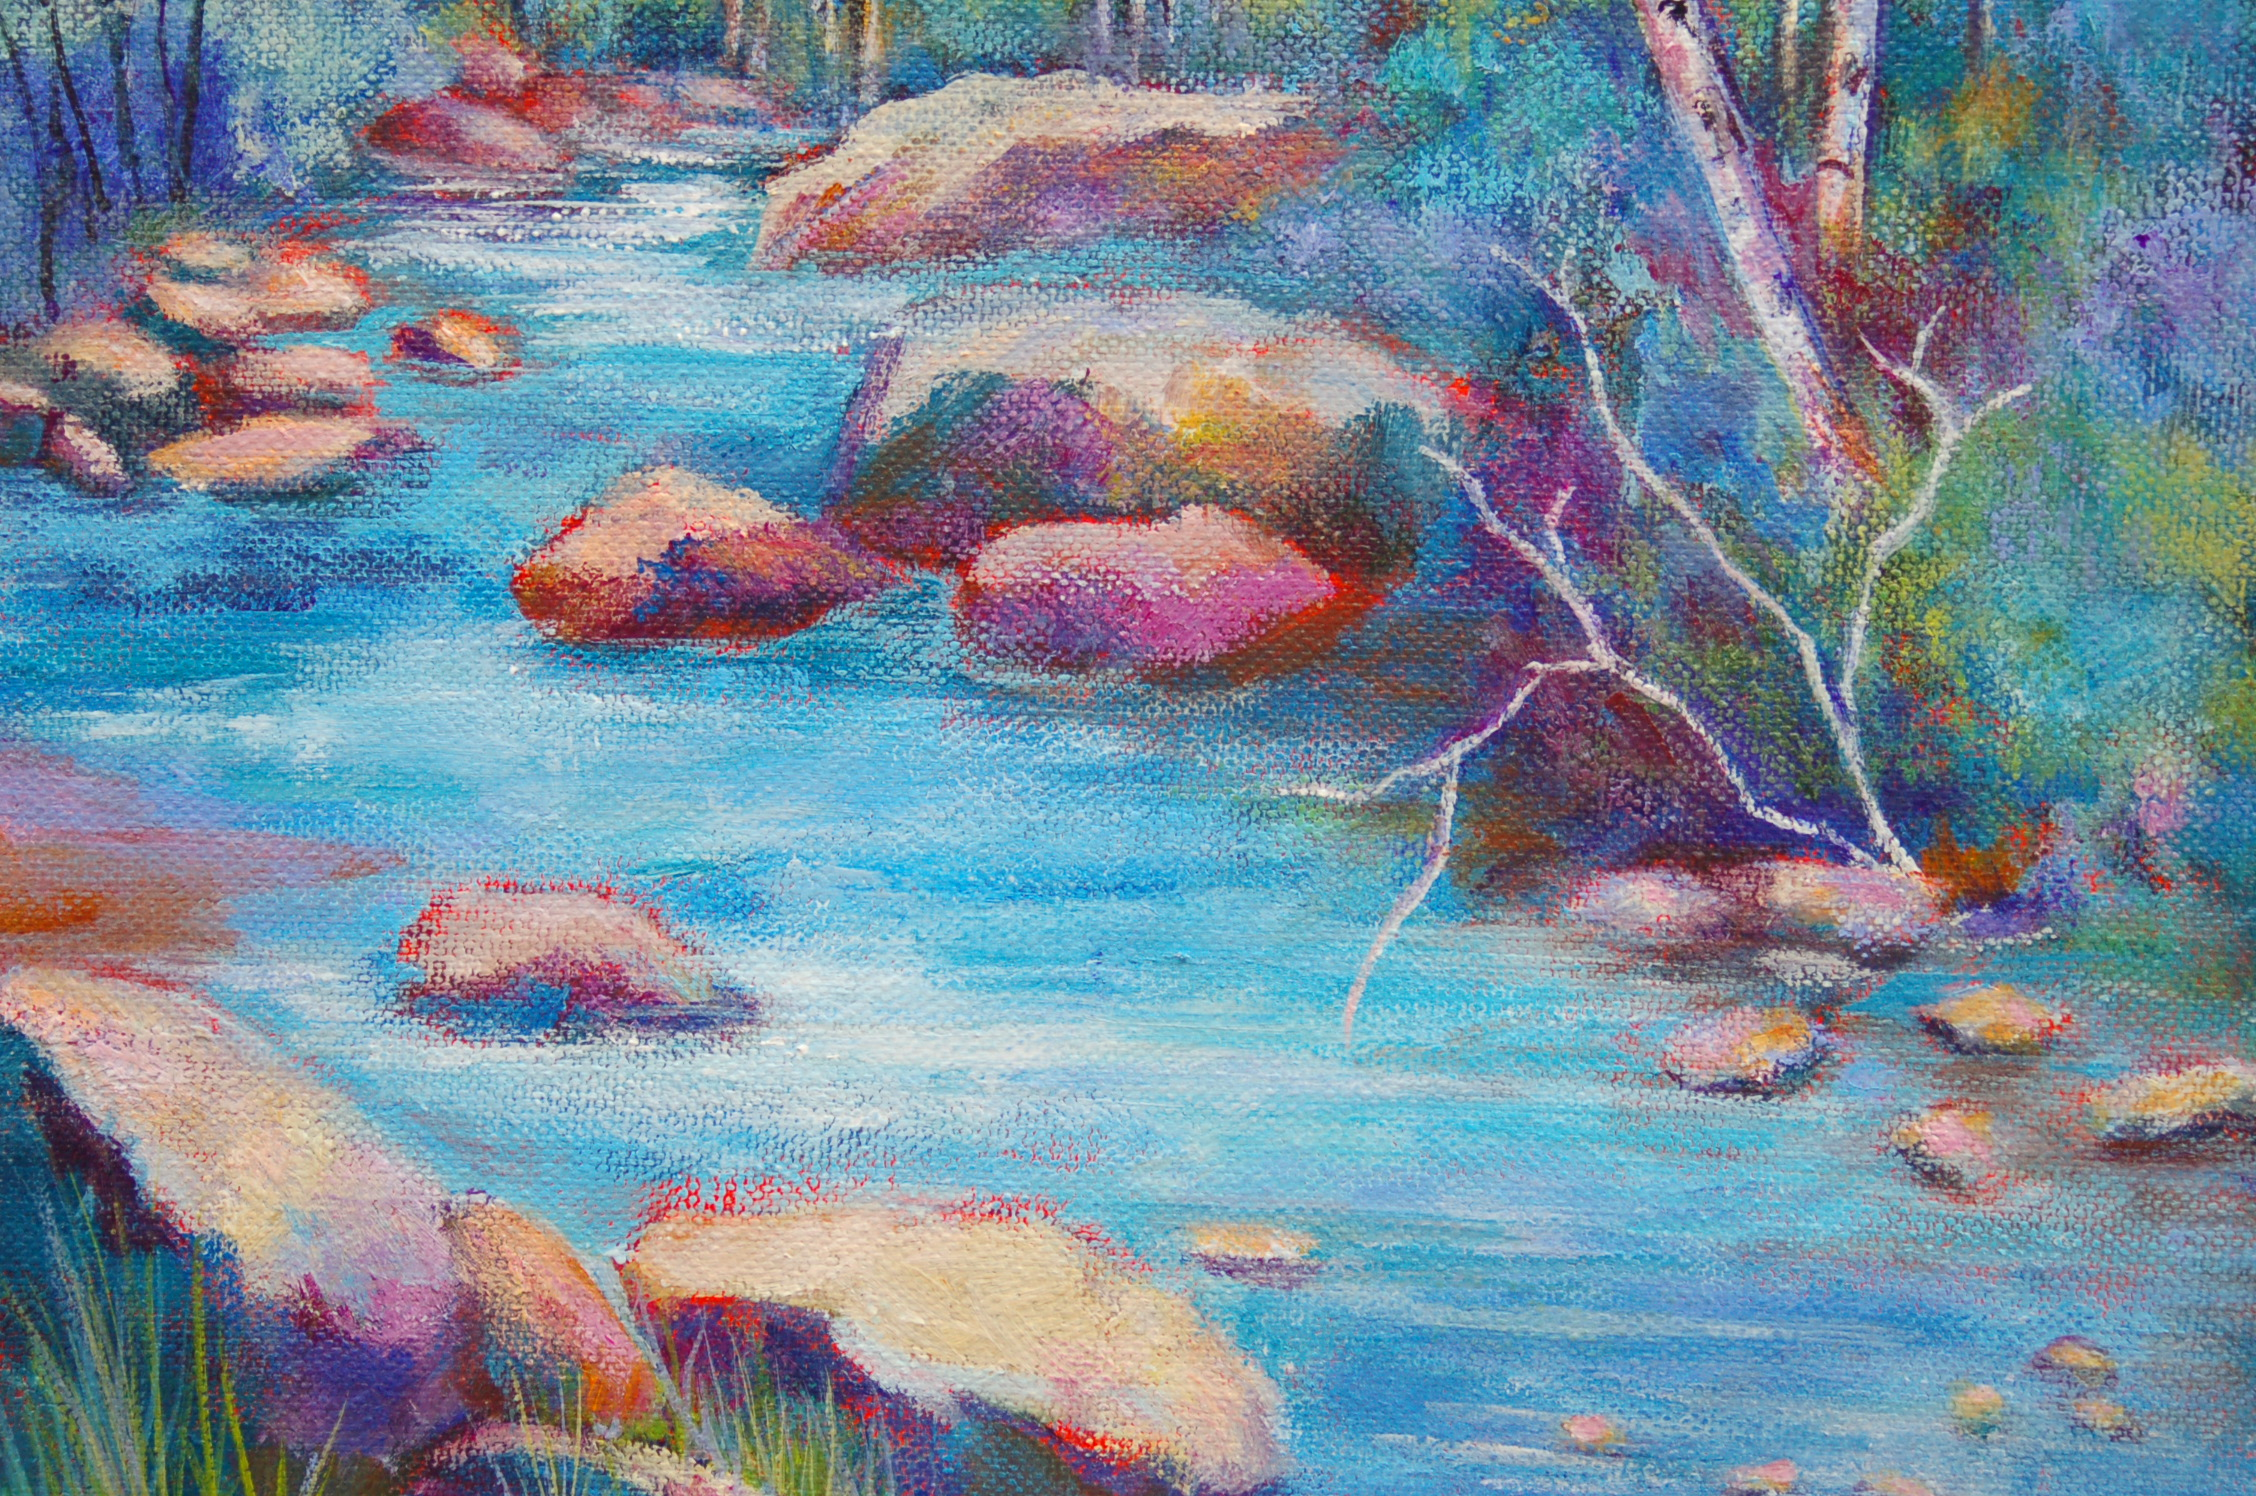 Lakestream